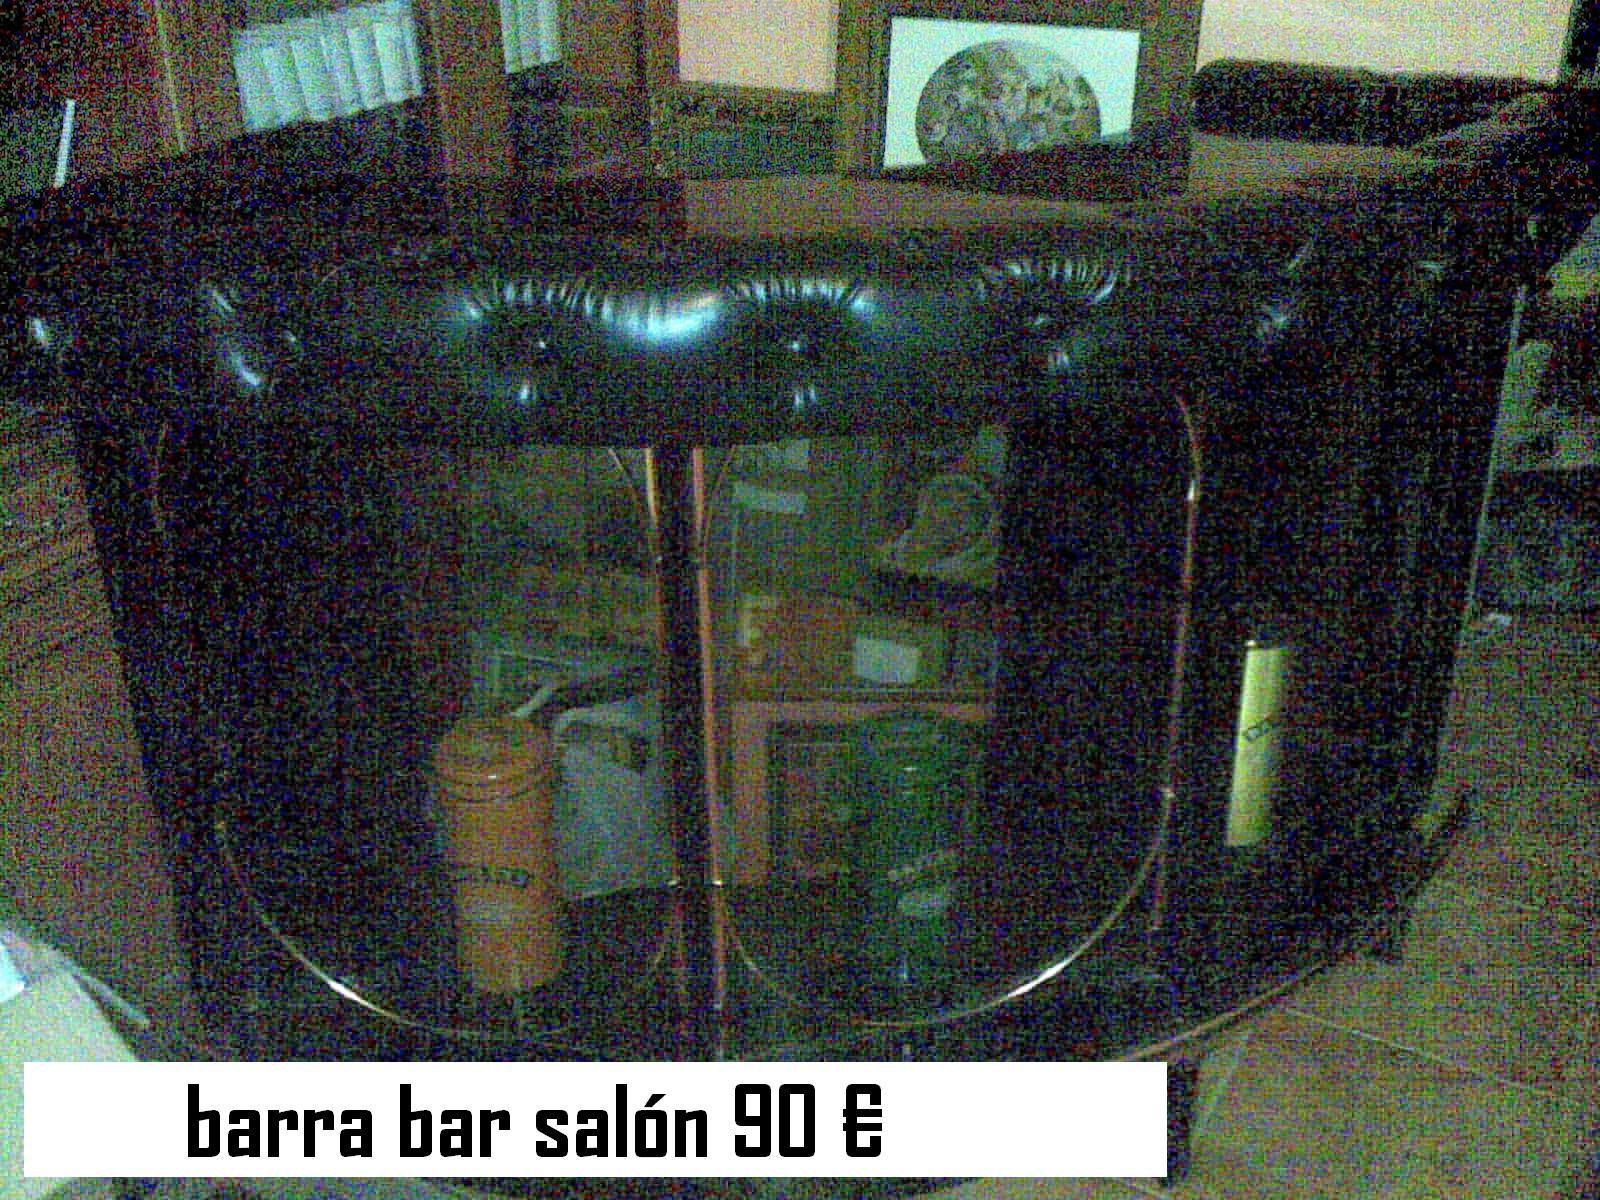 Venta mobiliario por traslado urgente barra bar sal n - Barra bar salon ...